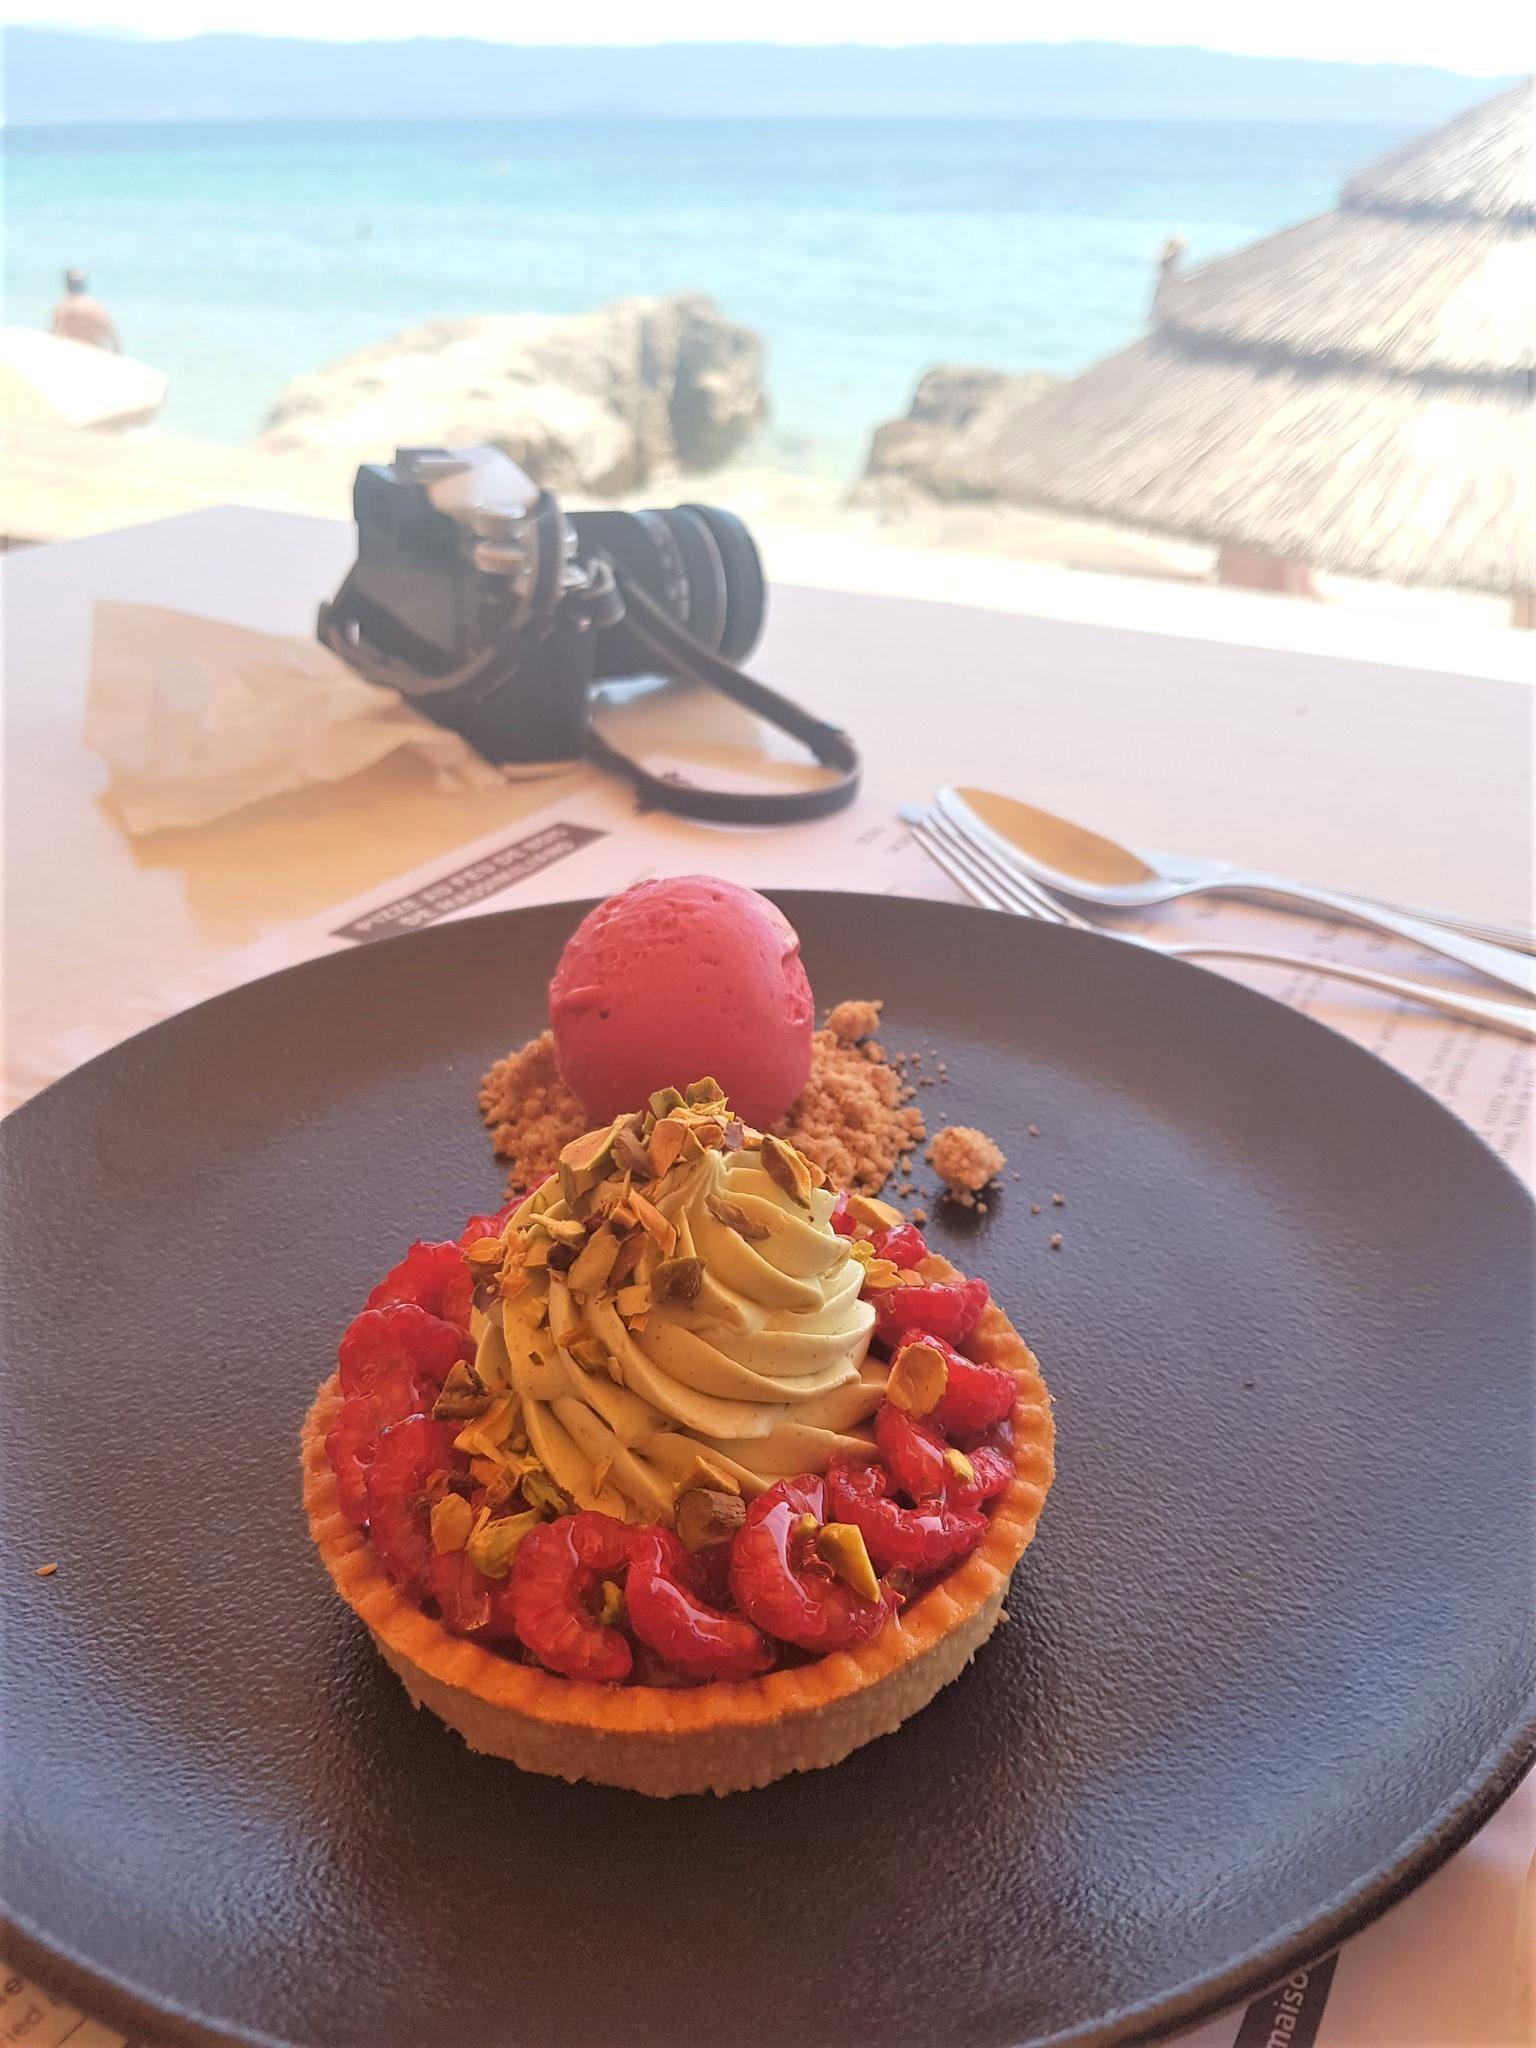 dessert au Neptune restaurant ajaccio blog voyage corse clioandco